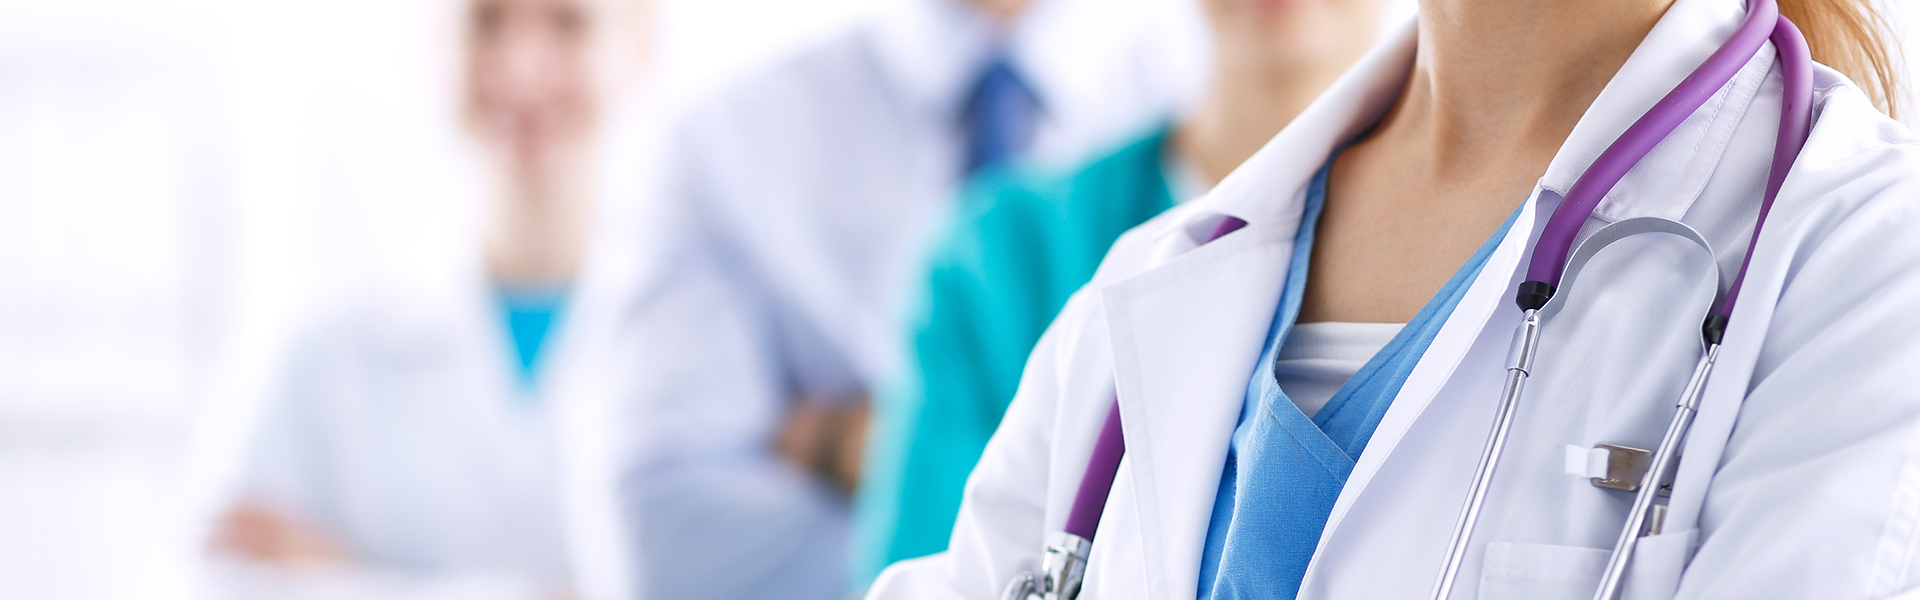 Centro medico studio medico cmed and partners roma parioli for Affitto studio medico roma parioli